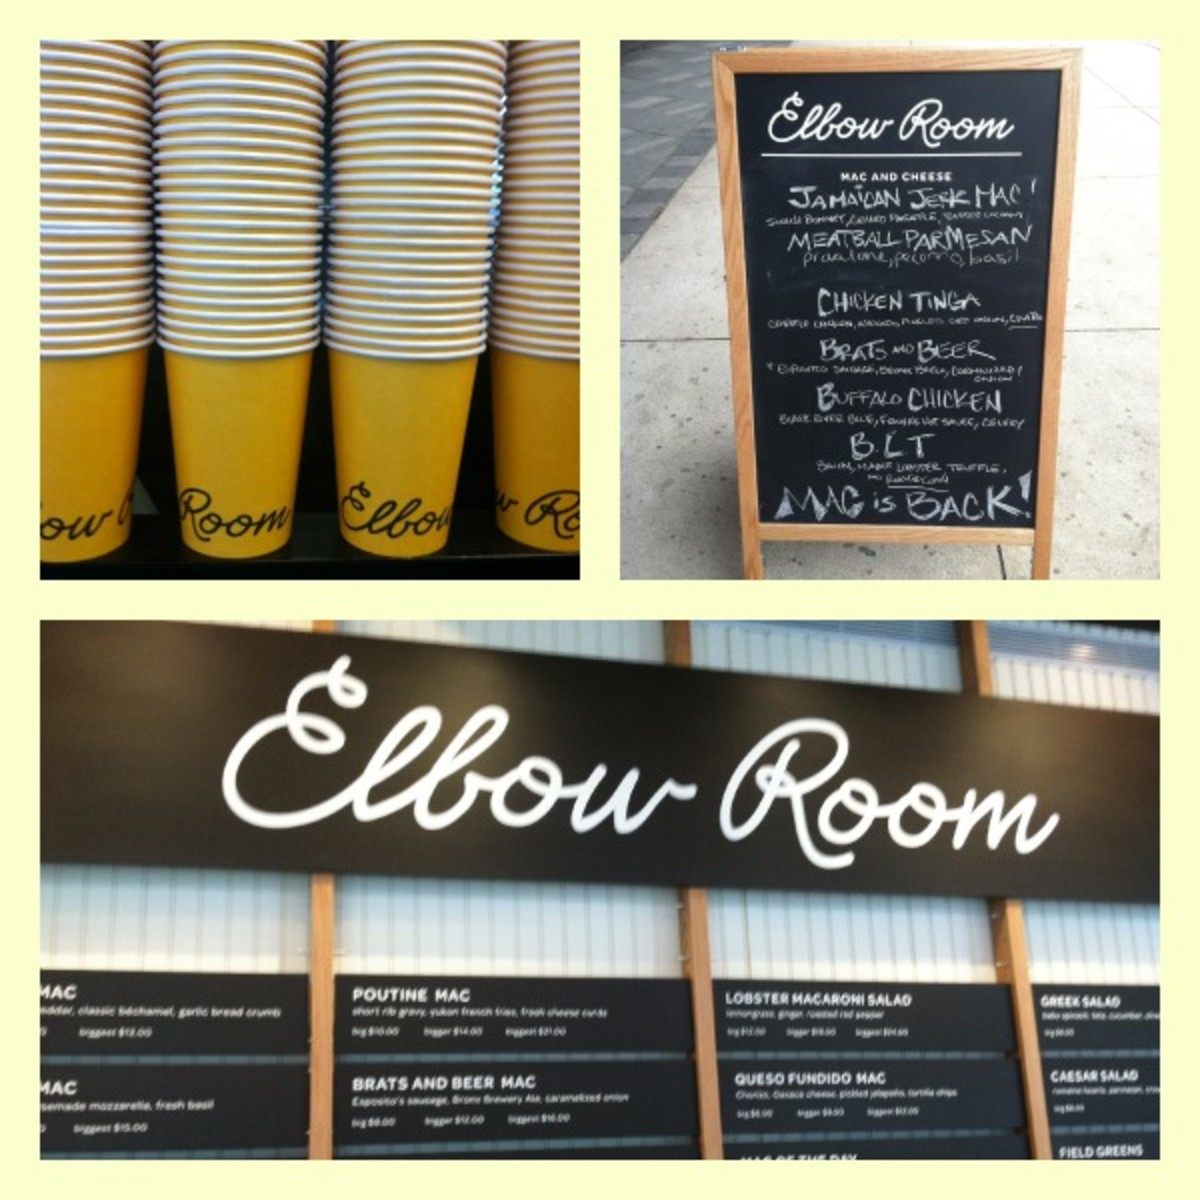 Elbow_Room